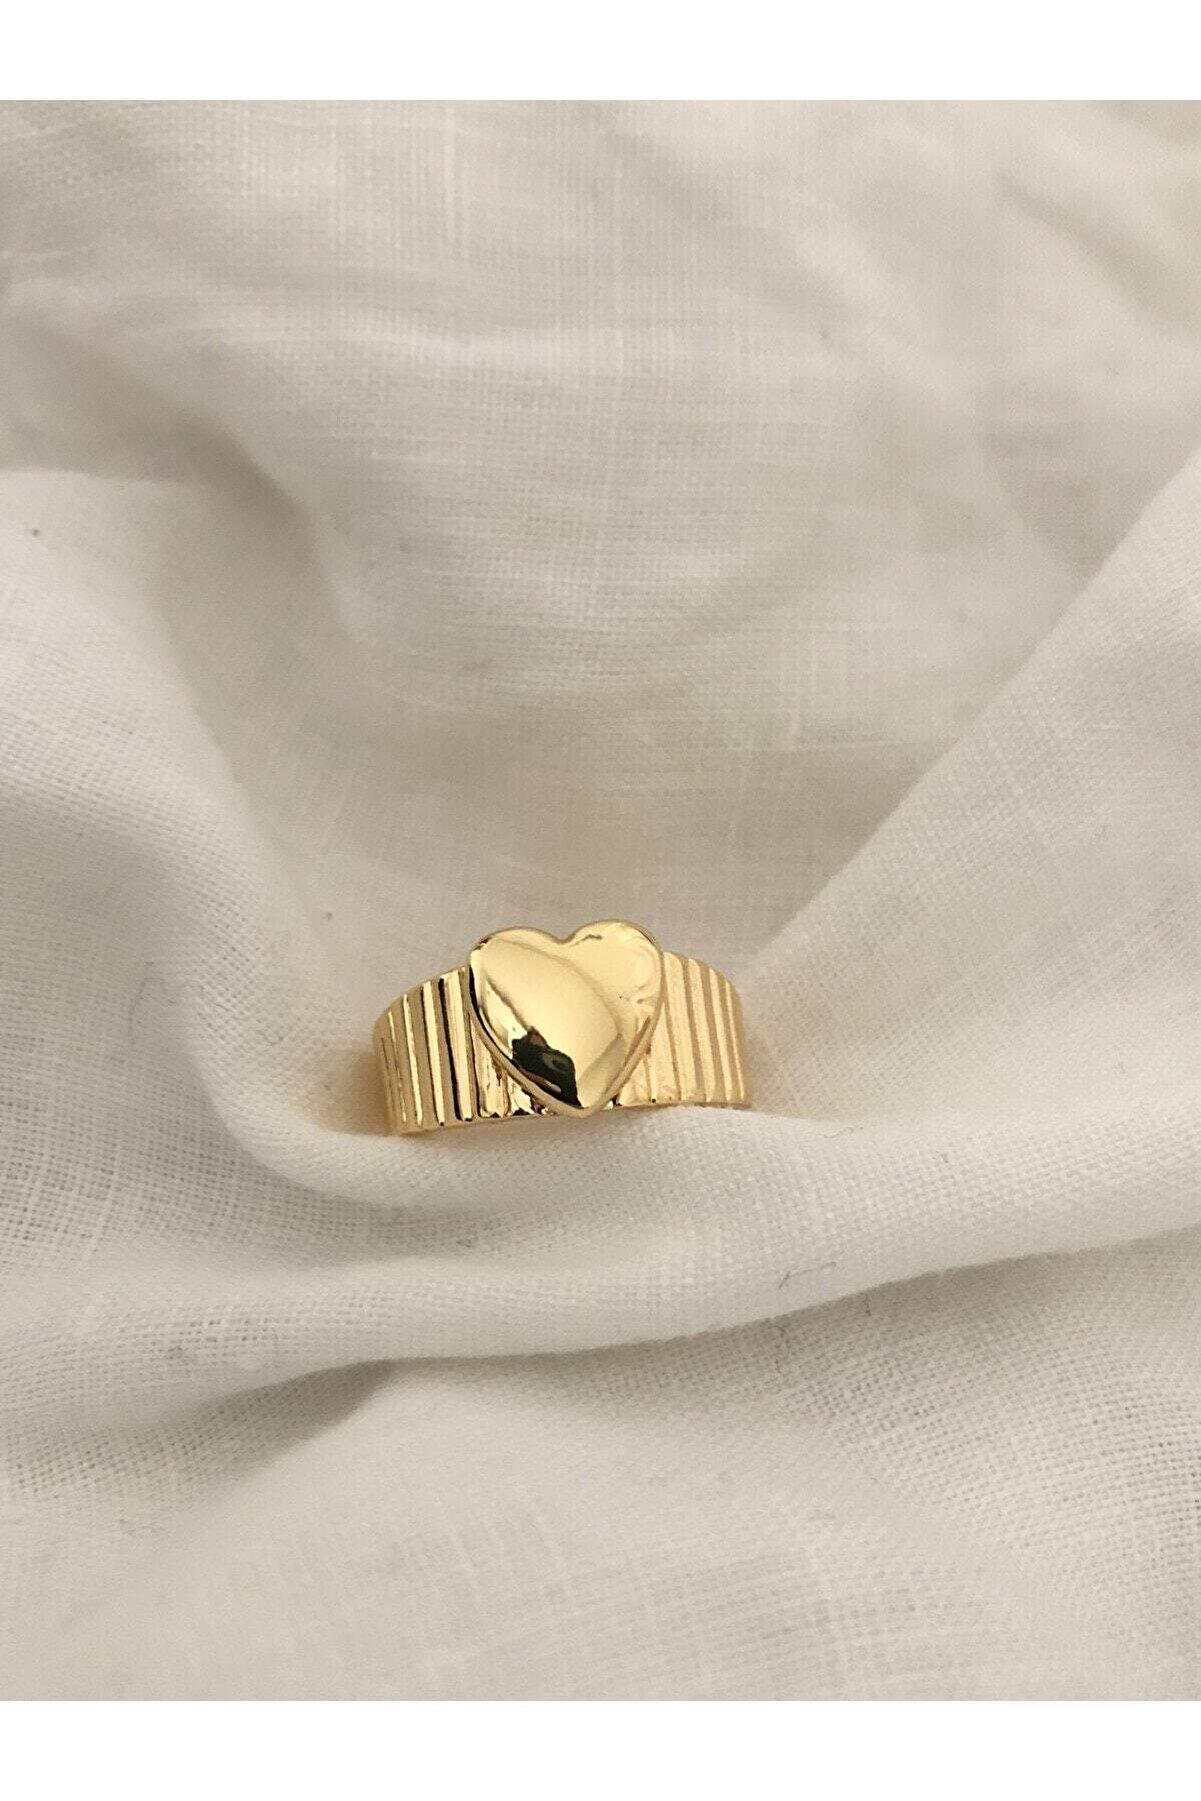 The Y Jewelry Vintage Kalp Yüzük -ayarlanabilir